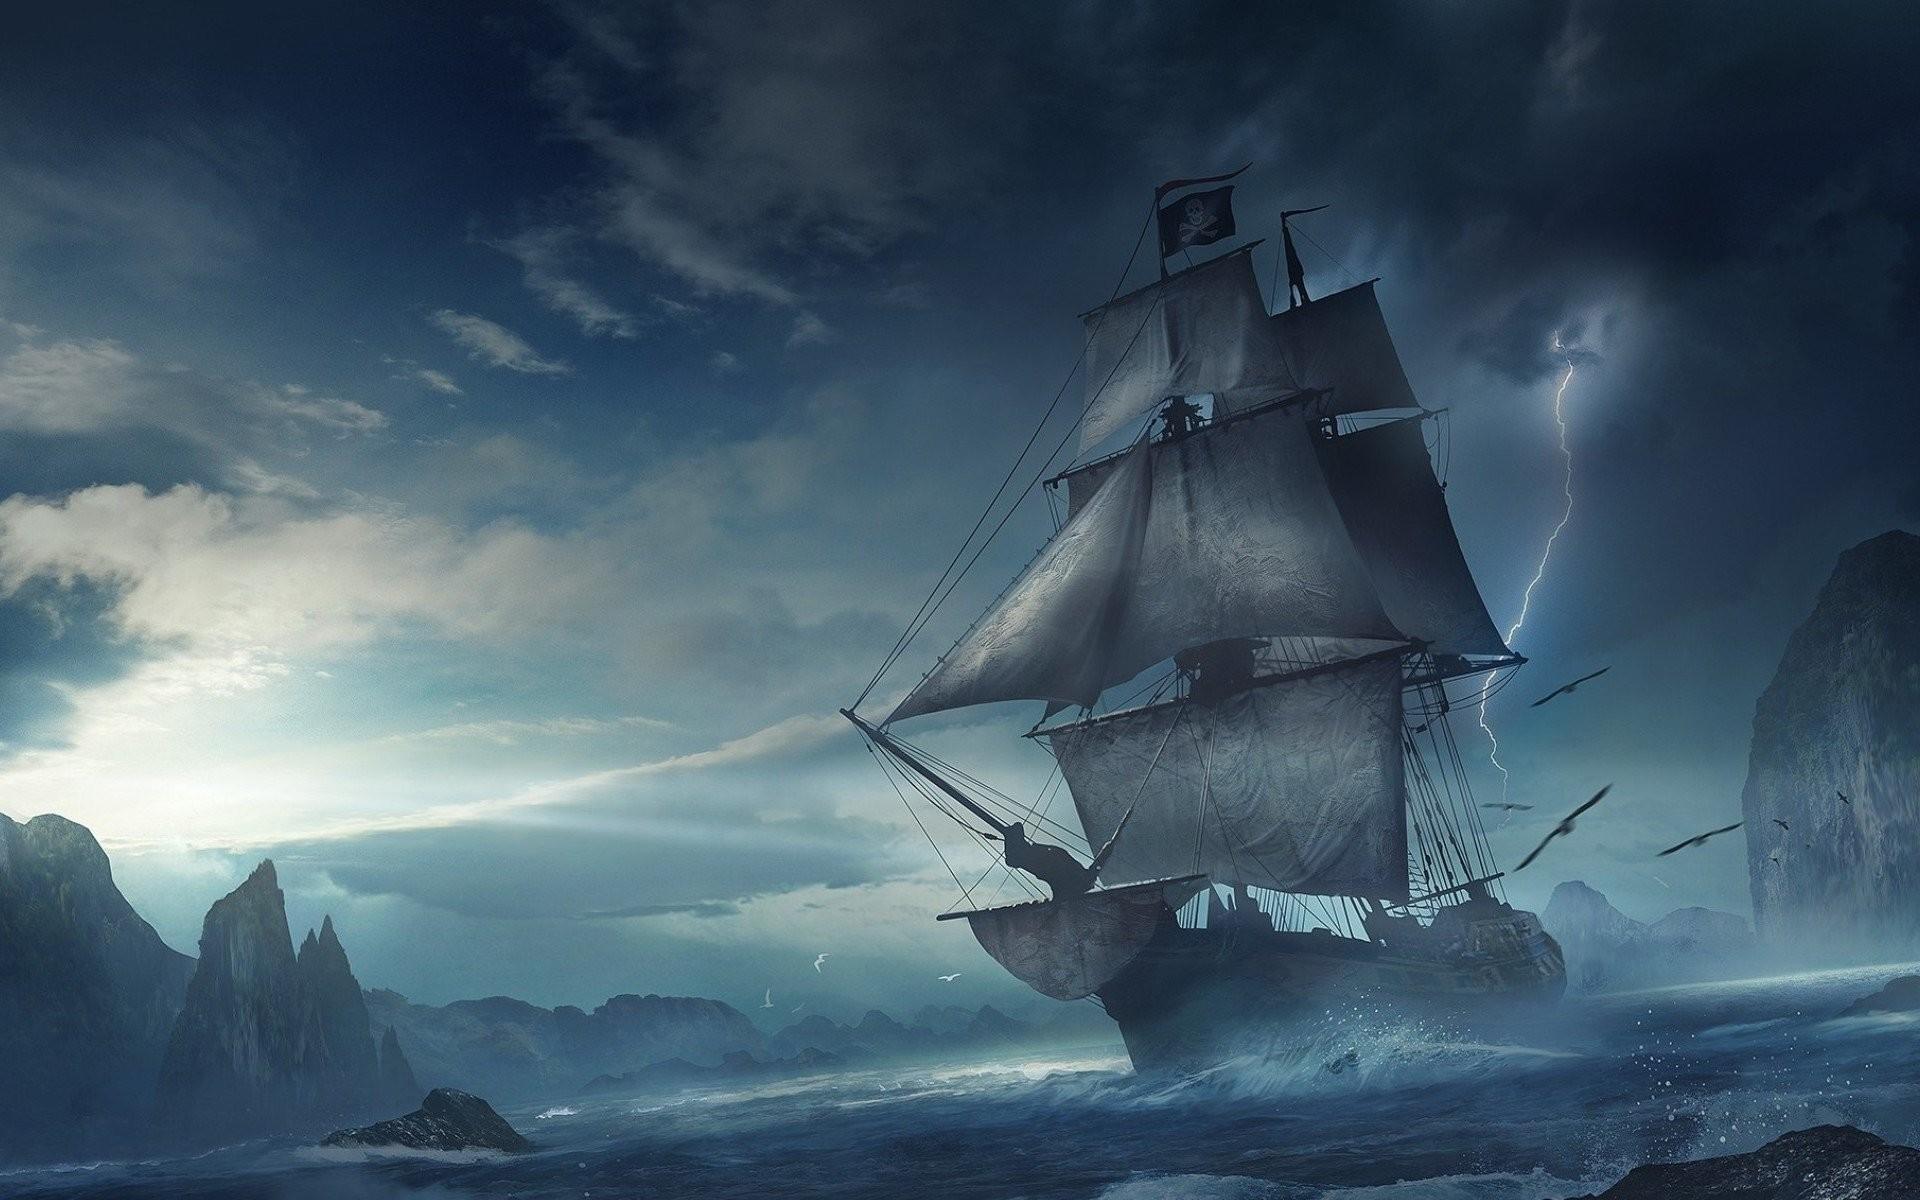 13 Pirate Ship Hd Wallpapers Backgrounds Wallpaper Ass Pirate Ship Wallpaper